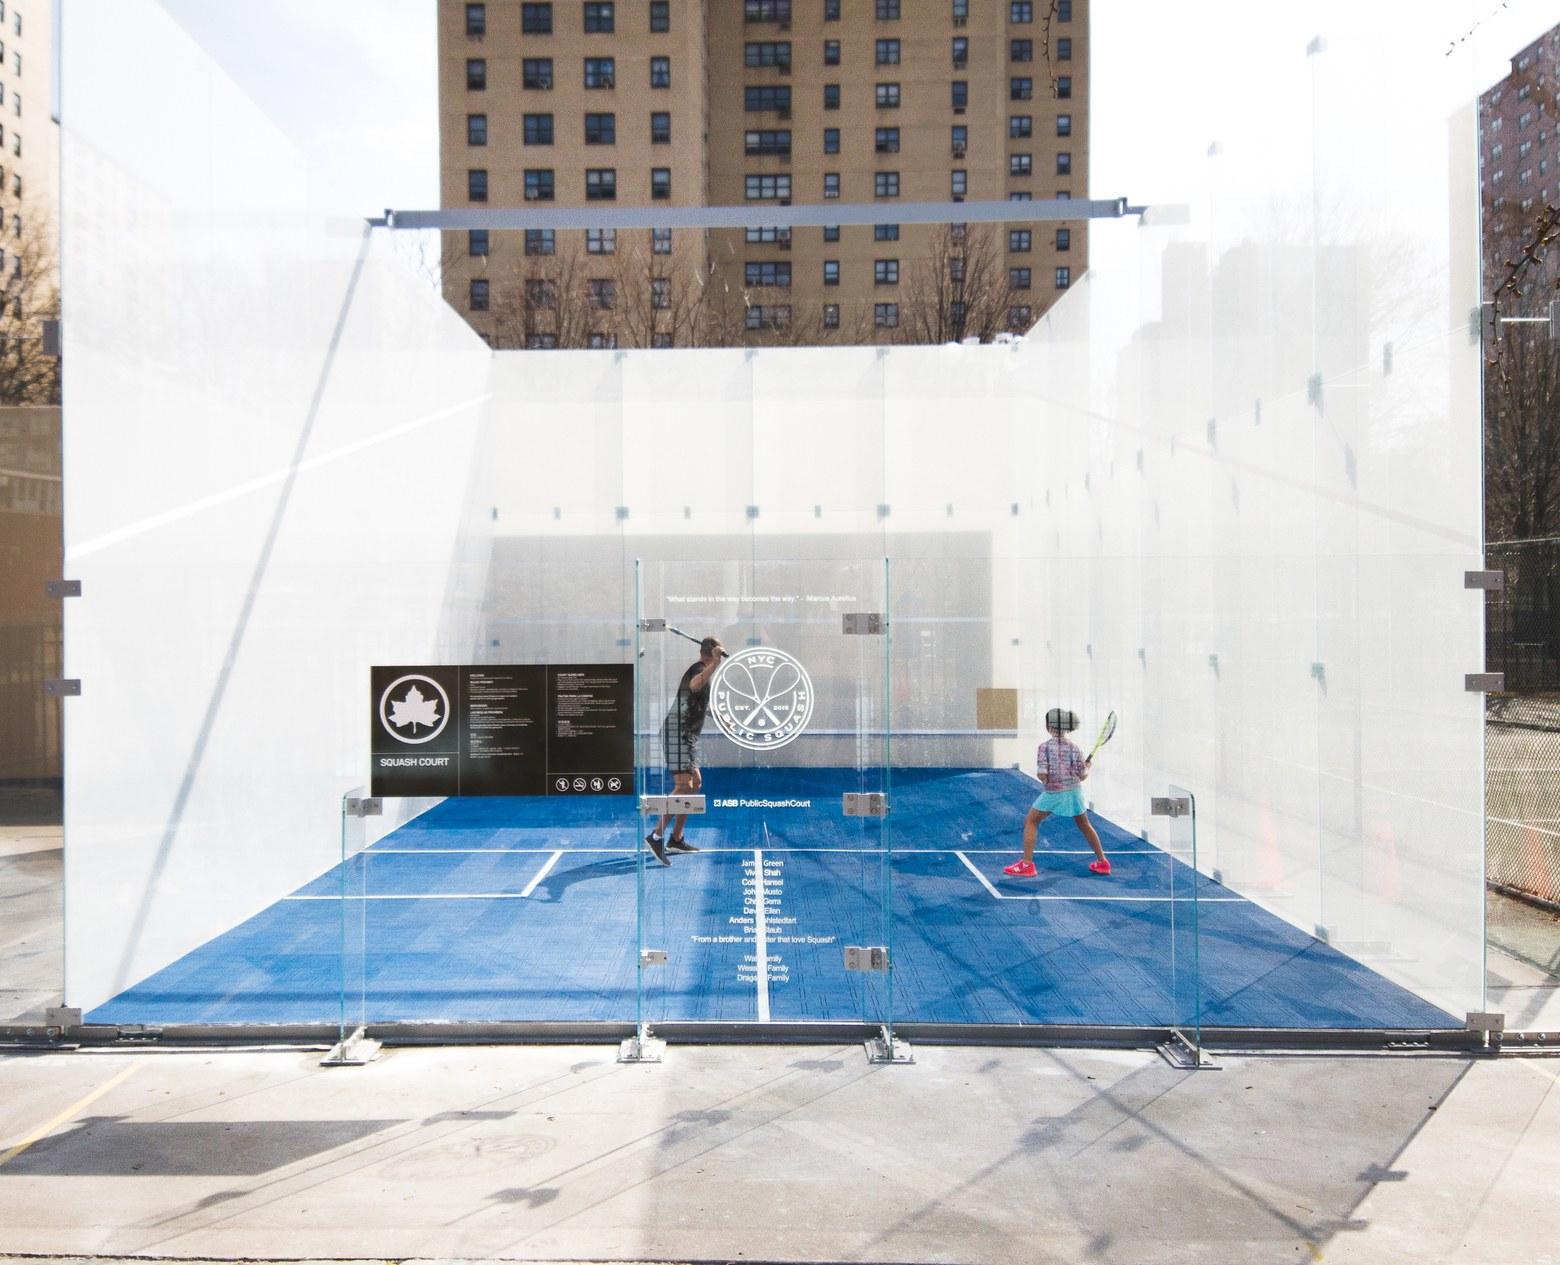 00-story-image-nyc-public-squash.jpg